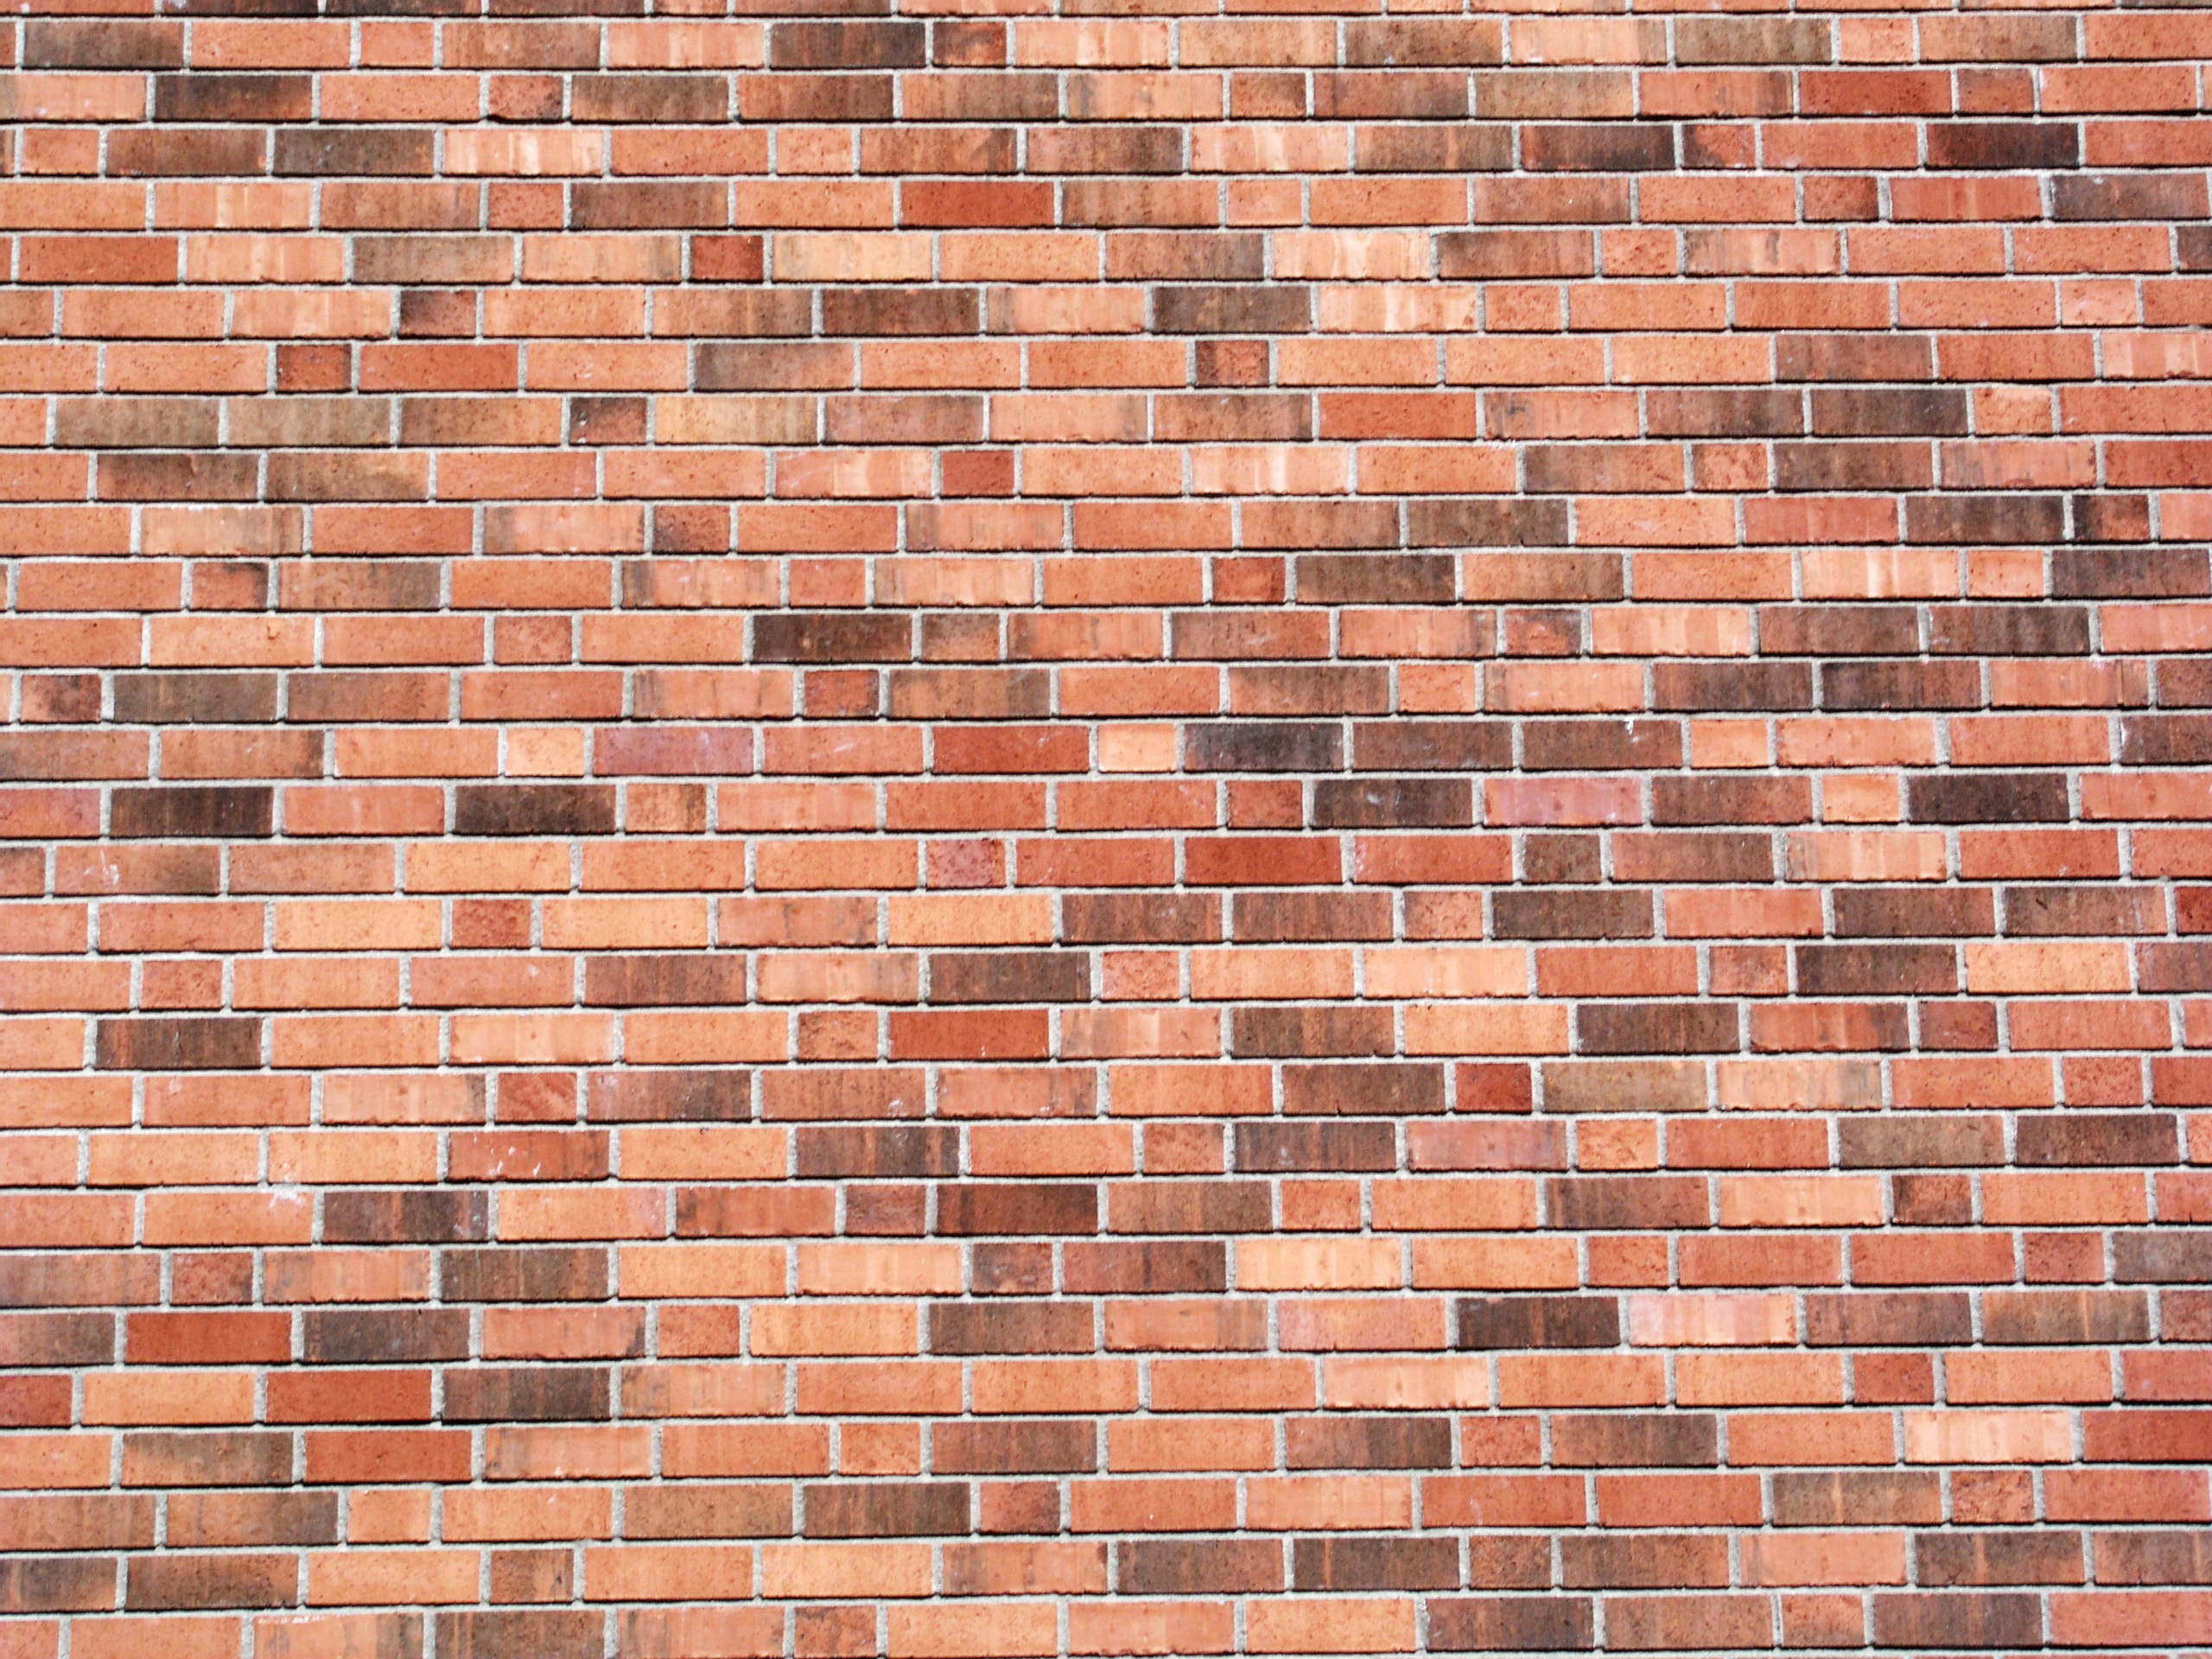 File:Solna Brick wall vilt forband.jpg